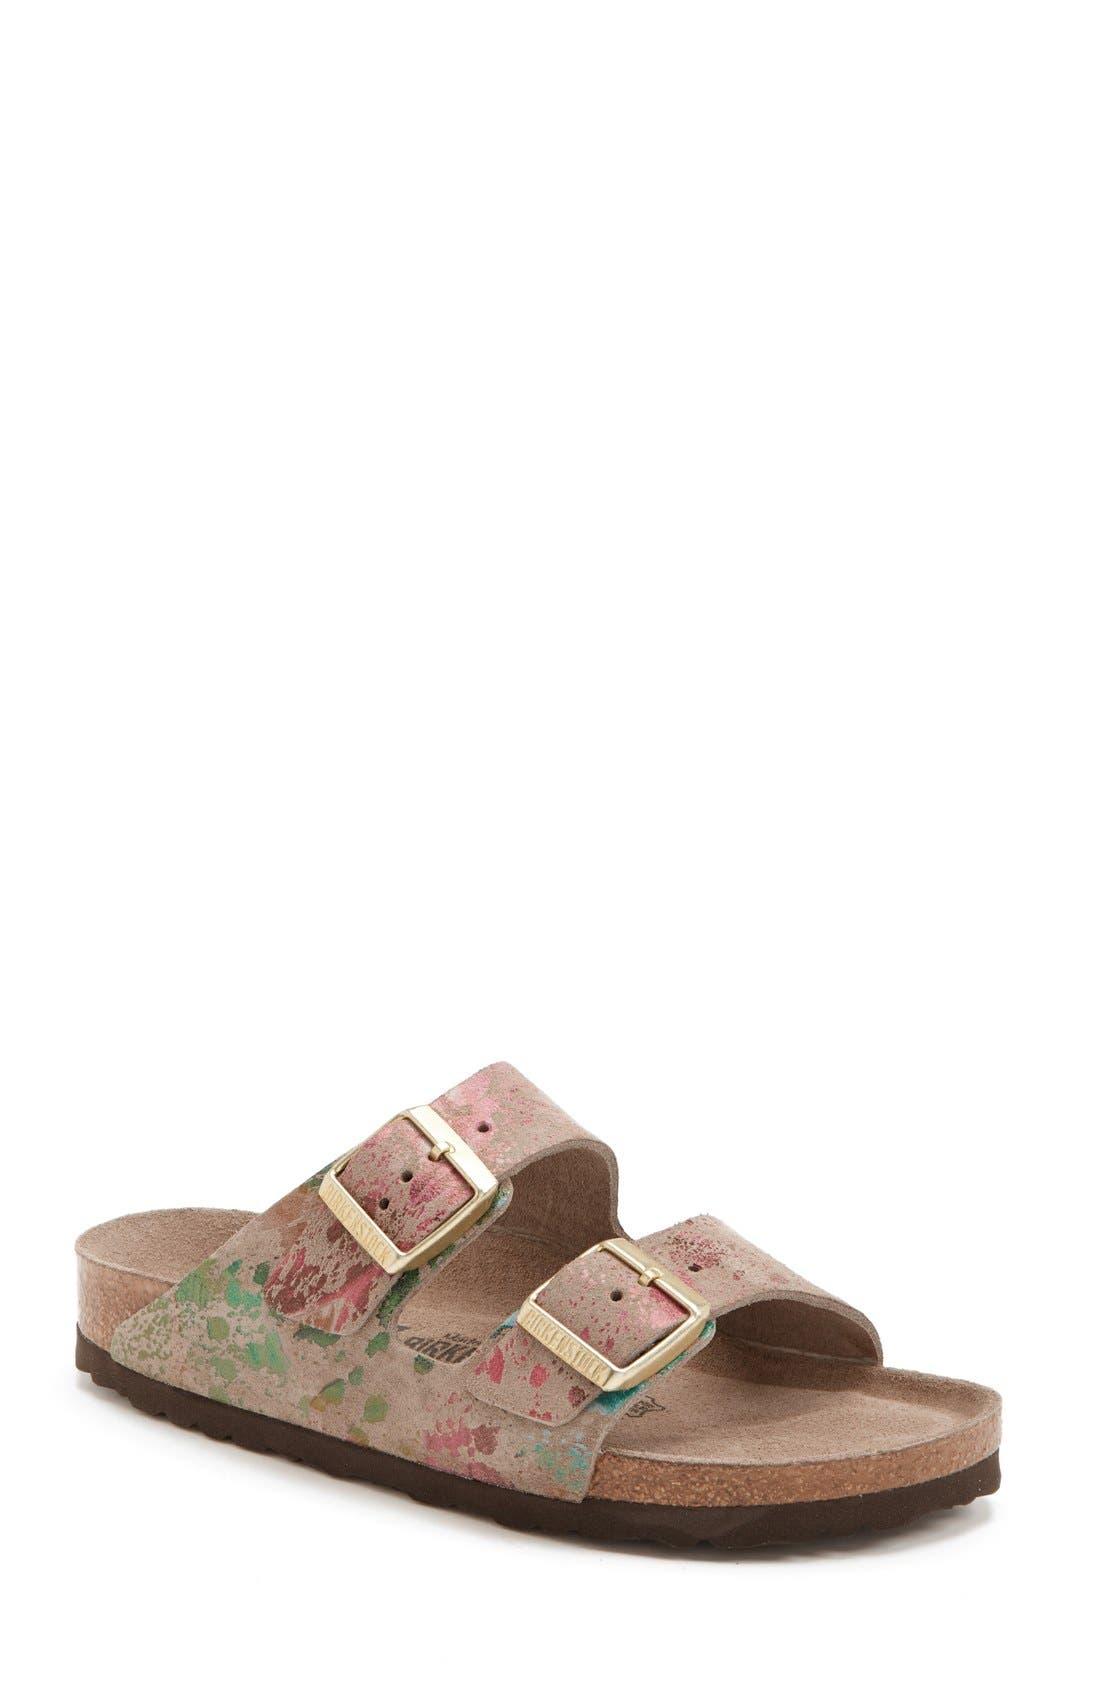 Alternate Image 1 Selected - Birkenstock 'Arizona' Soft Footbed Printed Leather Sandal (Women)